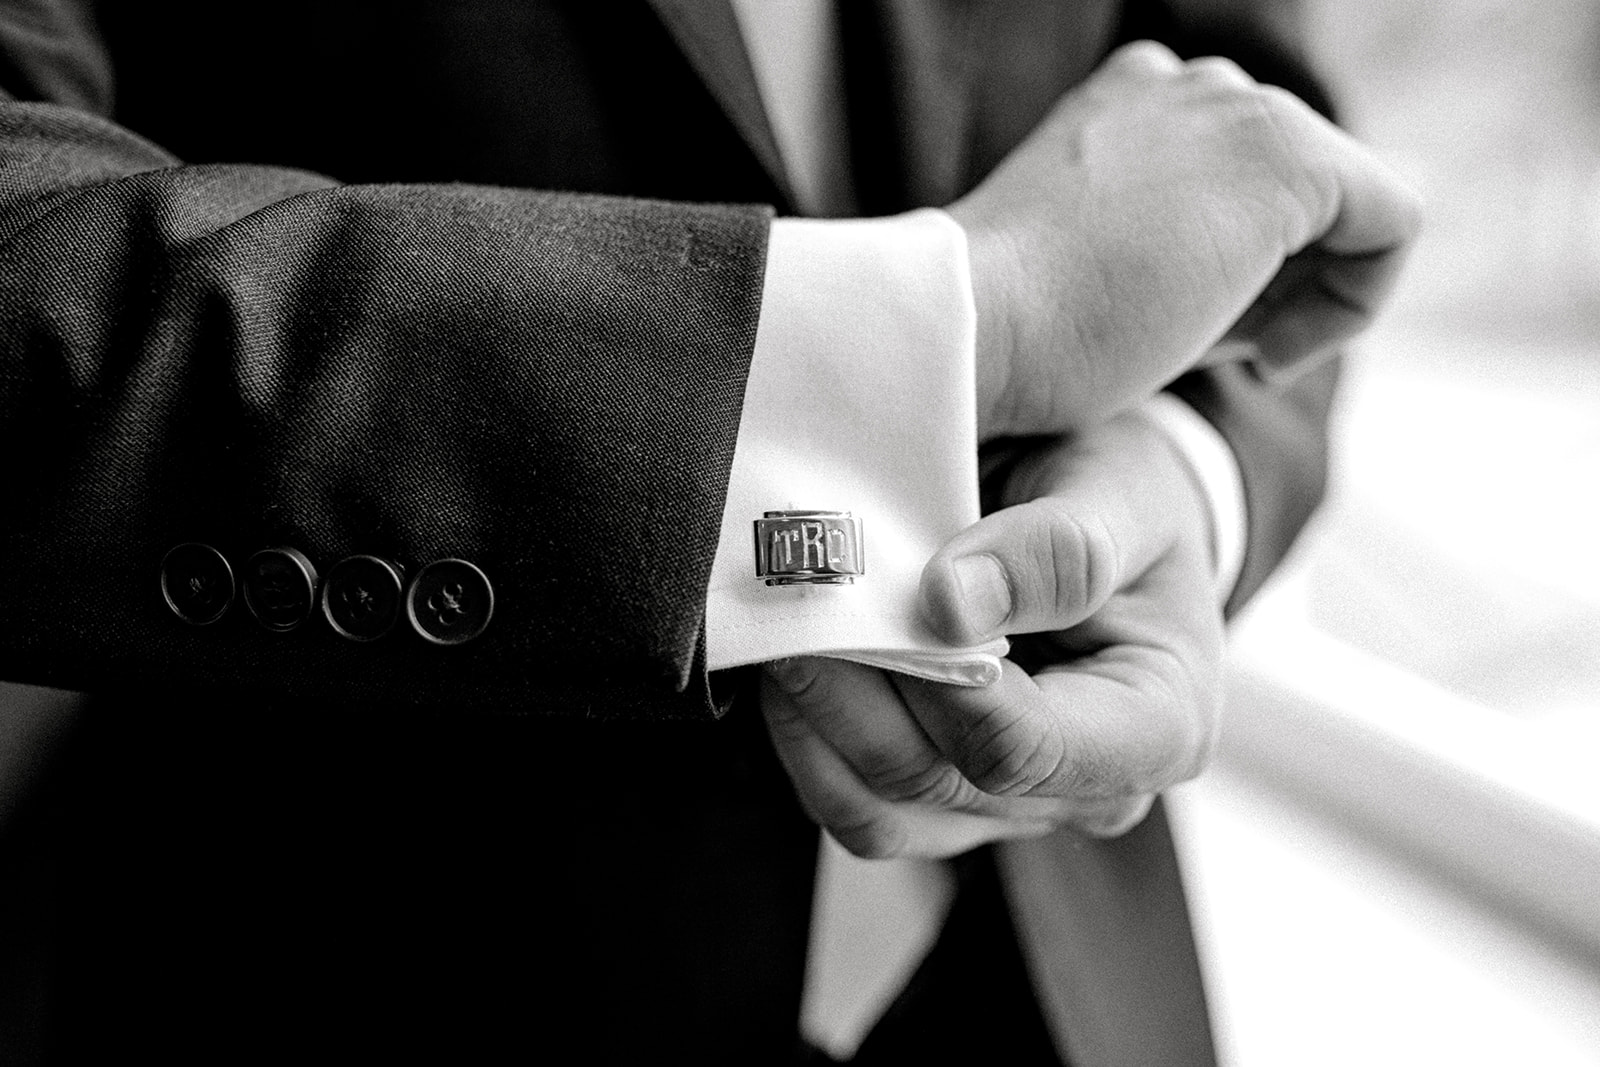 Monogrammed wedding cuff links